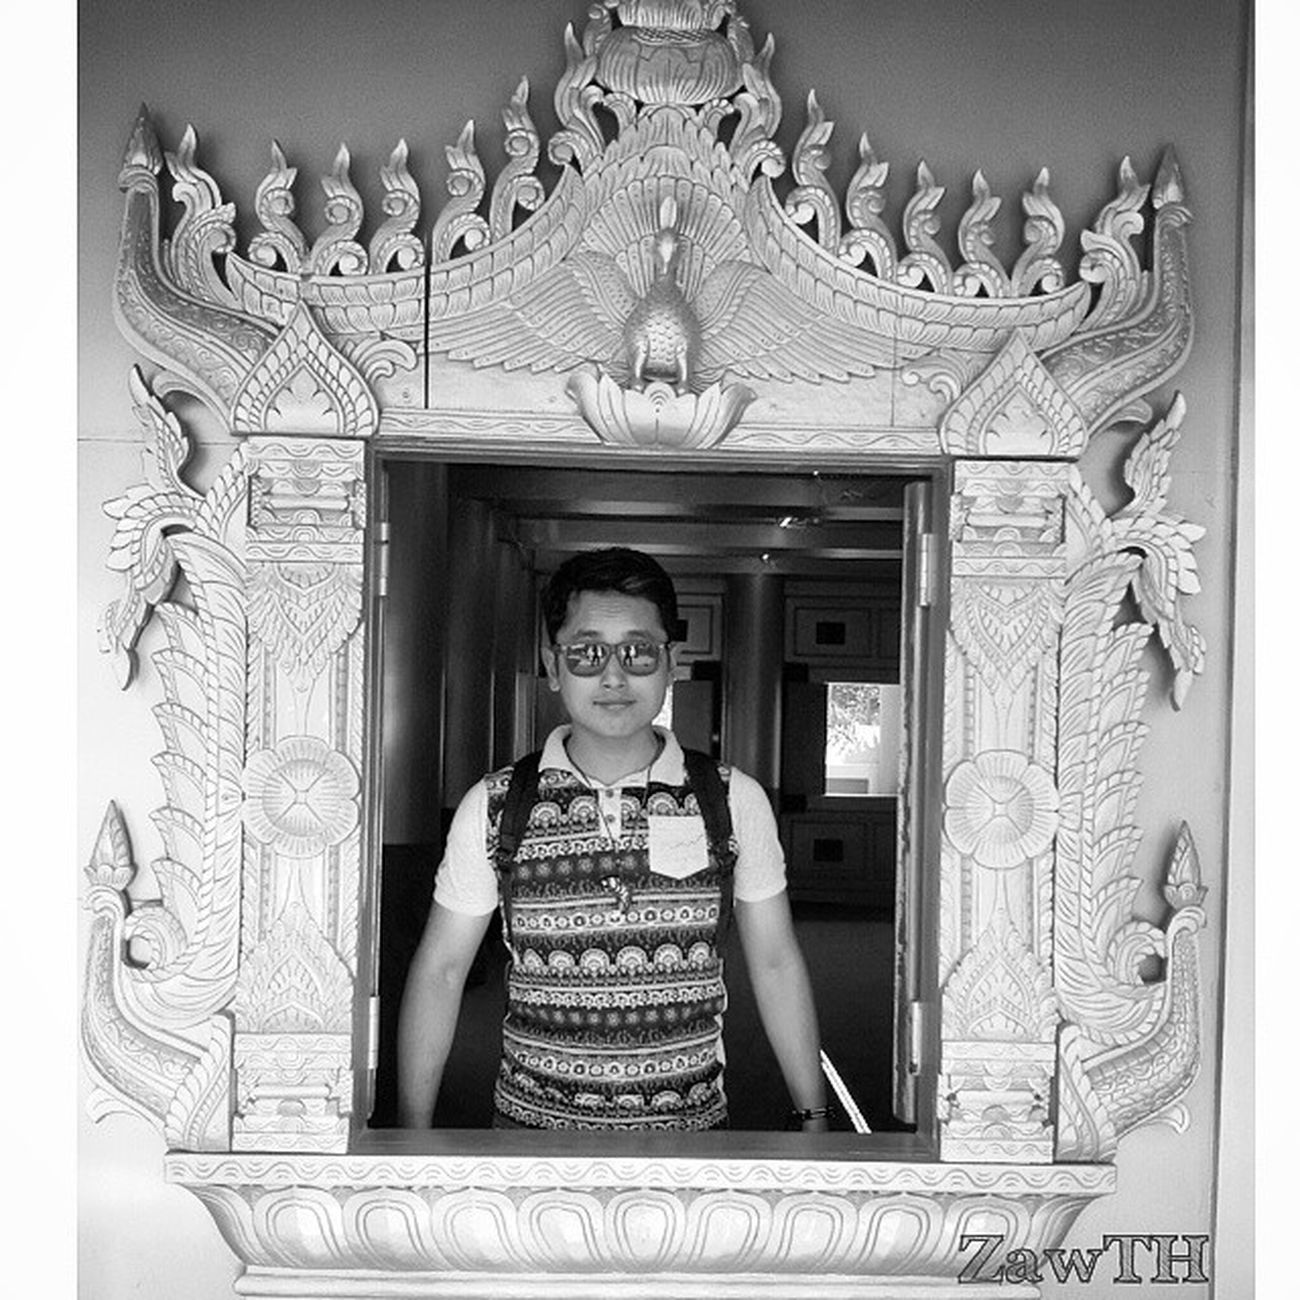 Window 2015. Window Goldenland Mandalay Myanmar Myanmarphotos Burma Igersmyanmar Igersmandalay Goldenland Myanmar Tagsforlikes Portrait Summer Instalife_shot Igglobal Igguy Ig_photo_life Bnw Blackandwhite Asianguys Amazingphotohunter Asianguy Bsnfamily Summer Burmeseguy Nepaleseboy vscomyanmar nepaleseguy phonephotography galaxygrand2 zawth